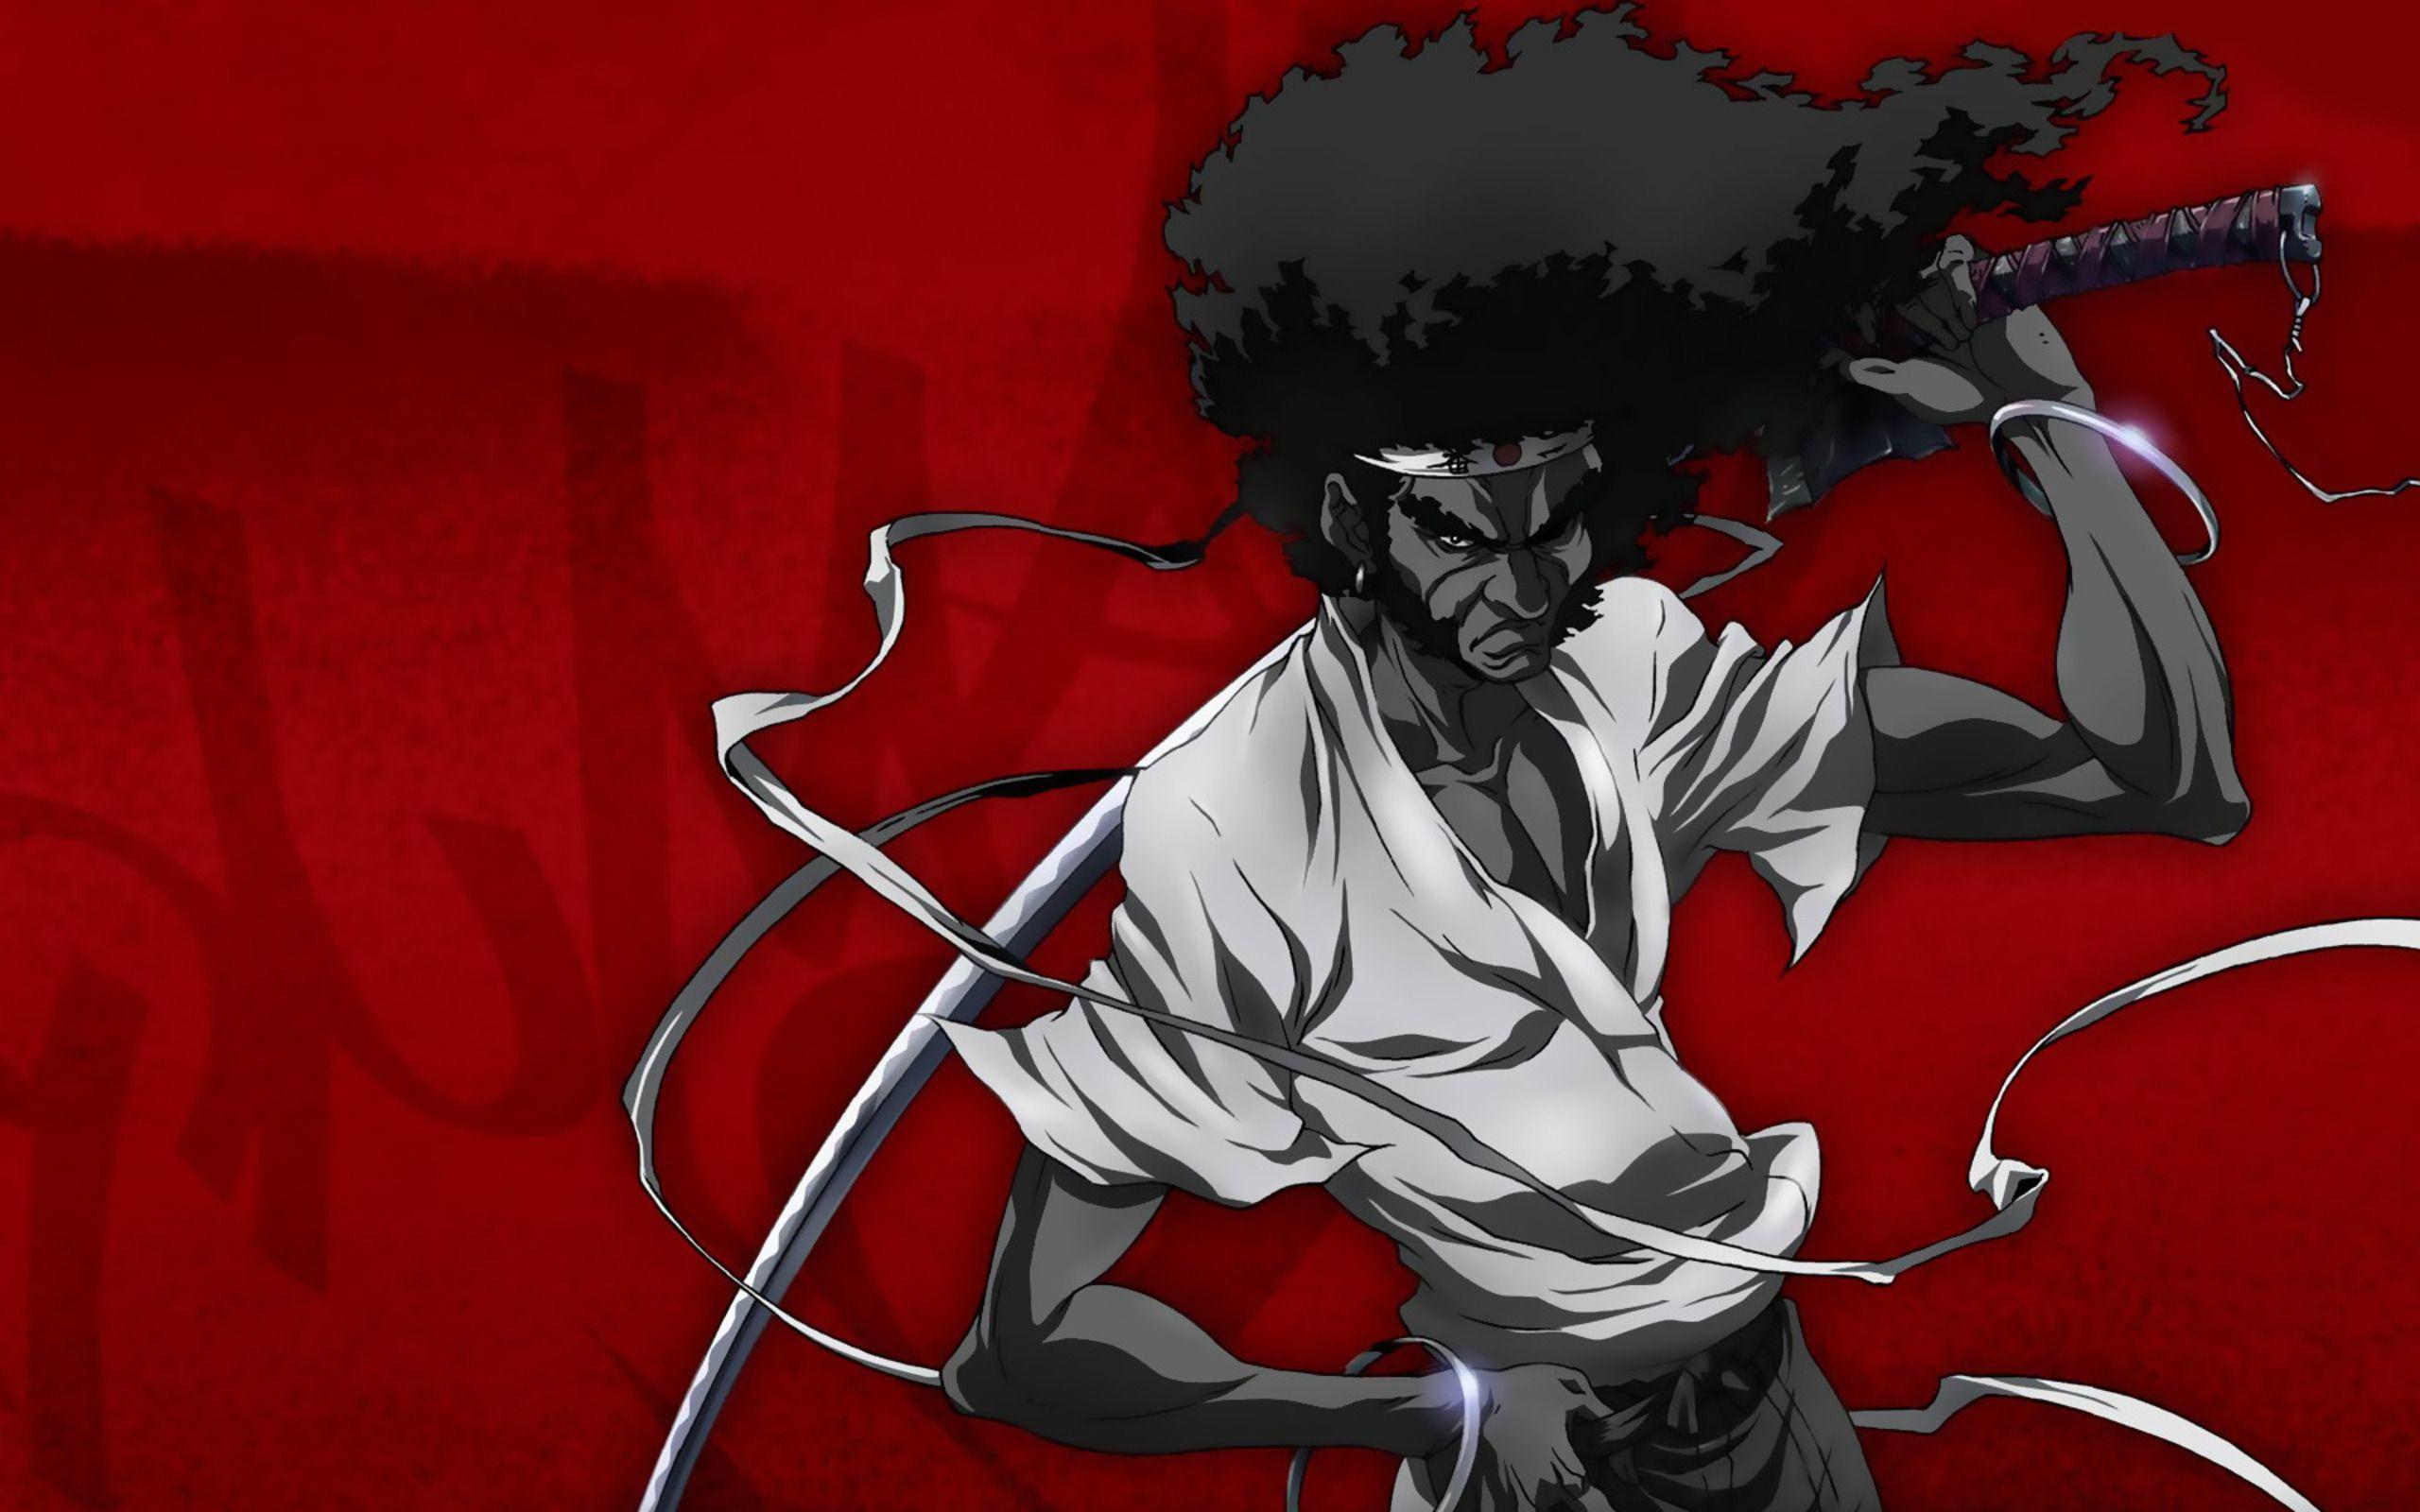 afro samurai anime game b wallpaper 2560x1600 91846